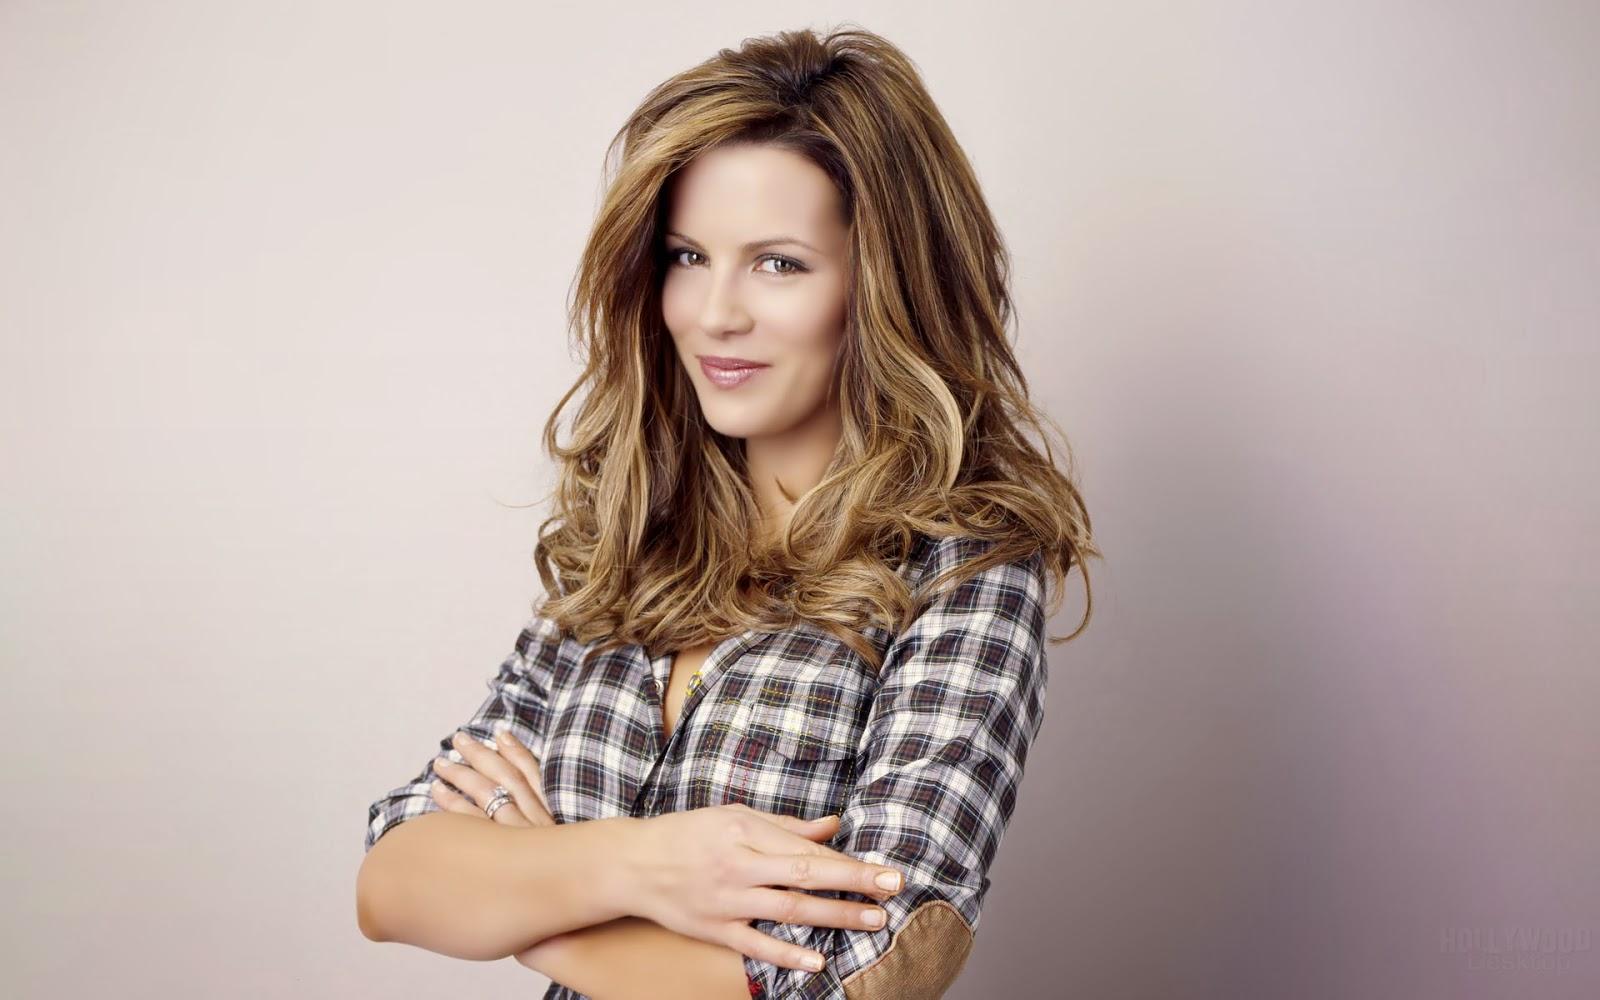 Live world hollywood beautiful actress wallpaper - Hollywood desktop wallpapers actresses ...